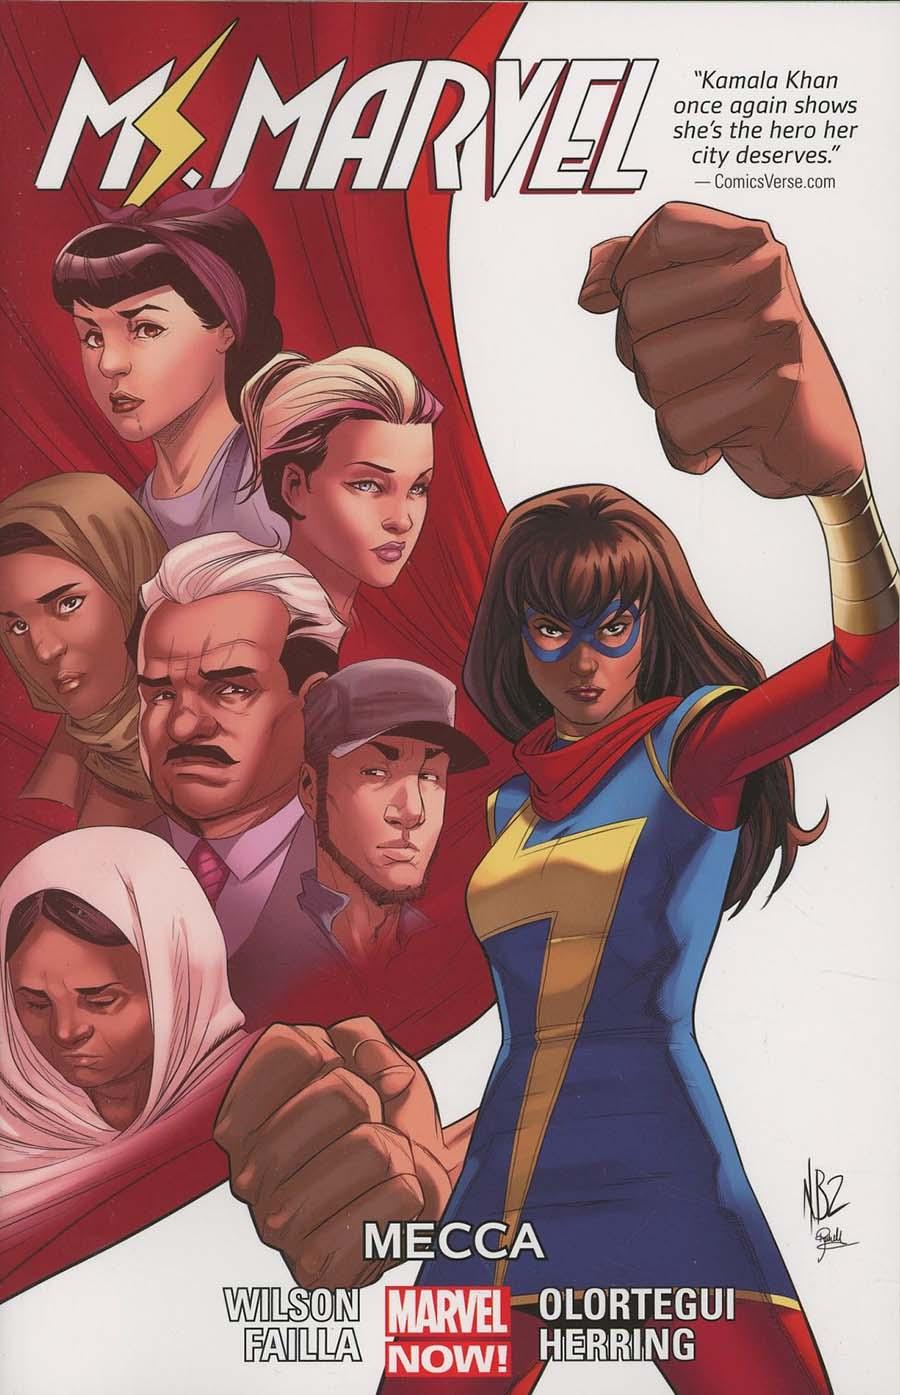 Ms Marvel (2014) Vol 8 Mecca TP